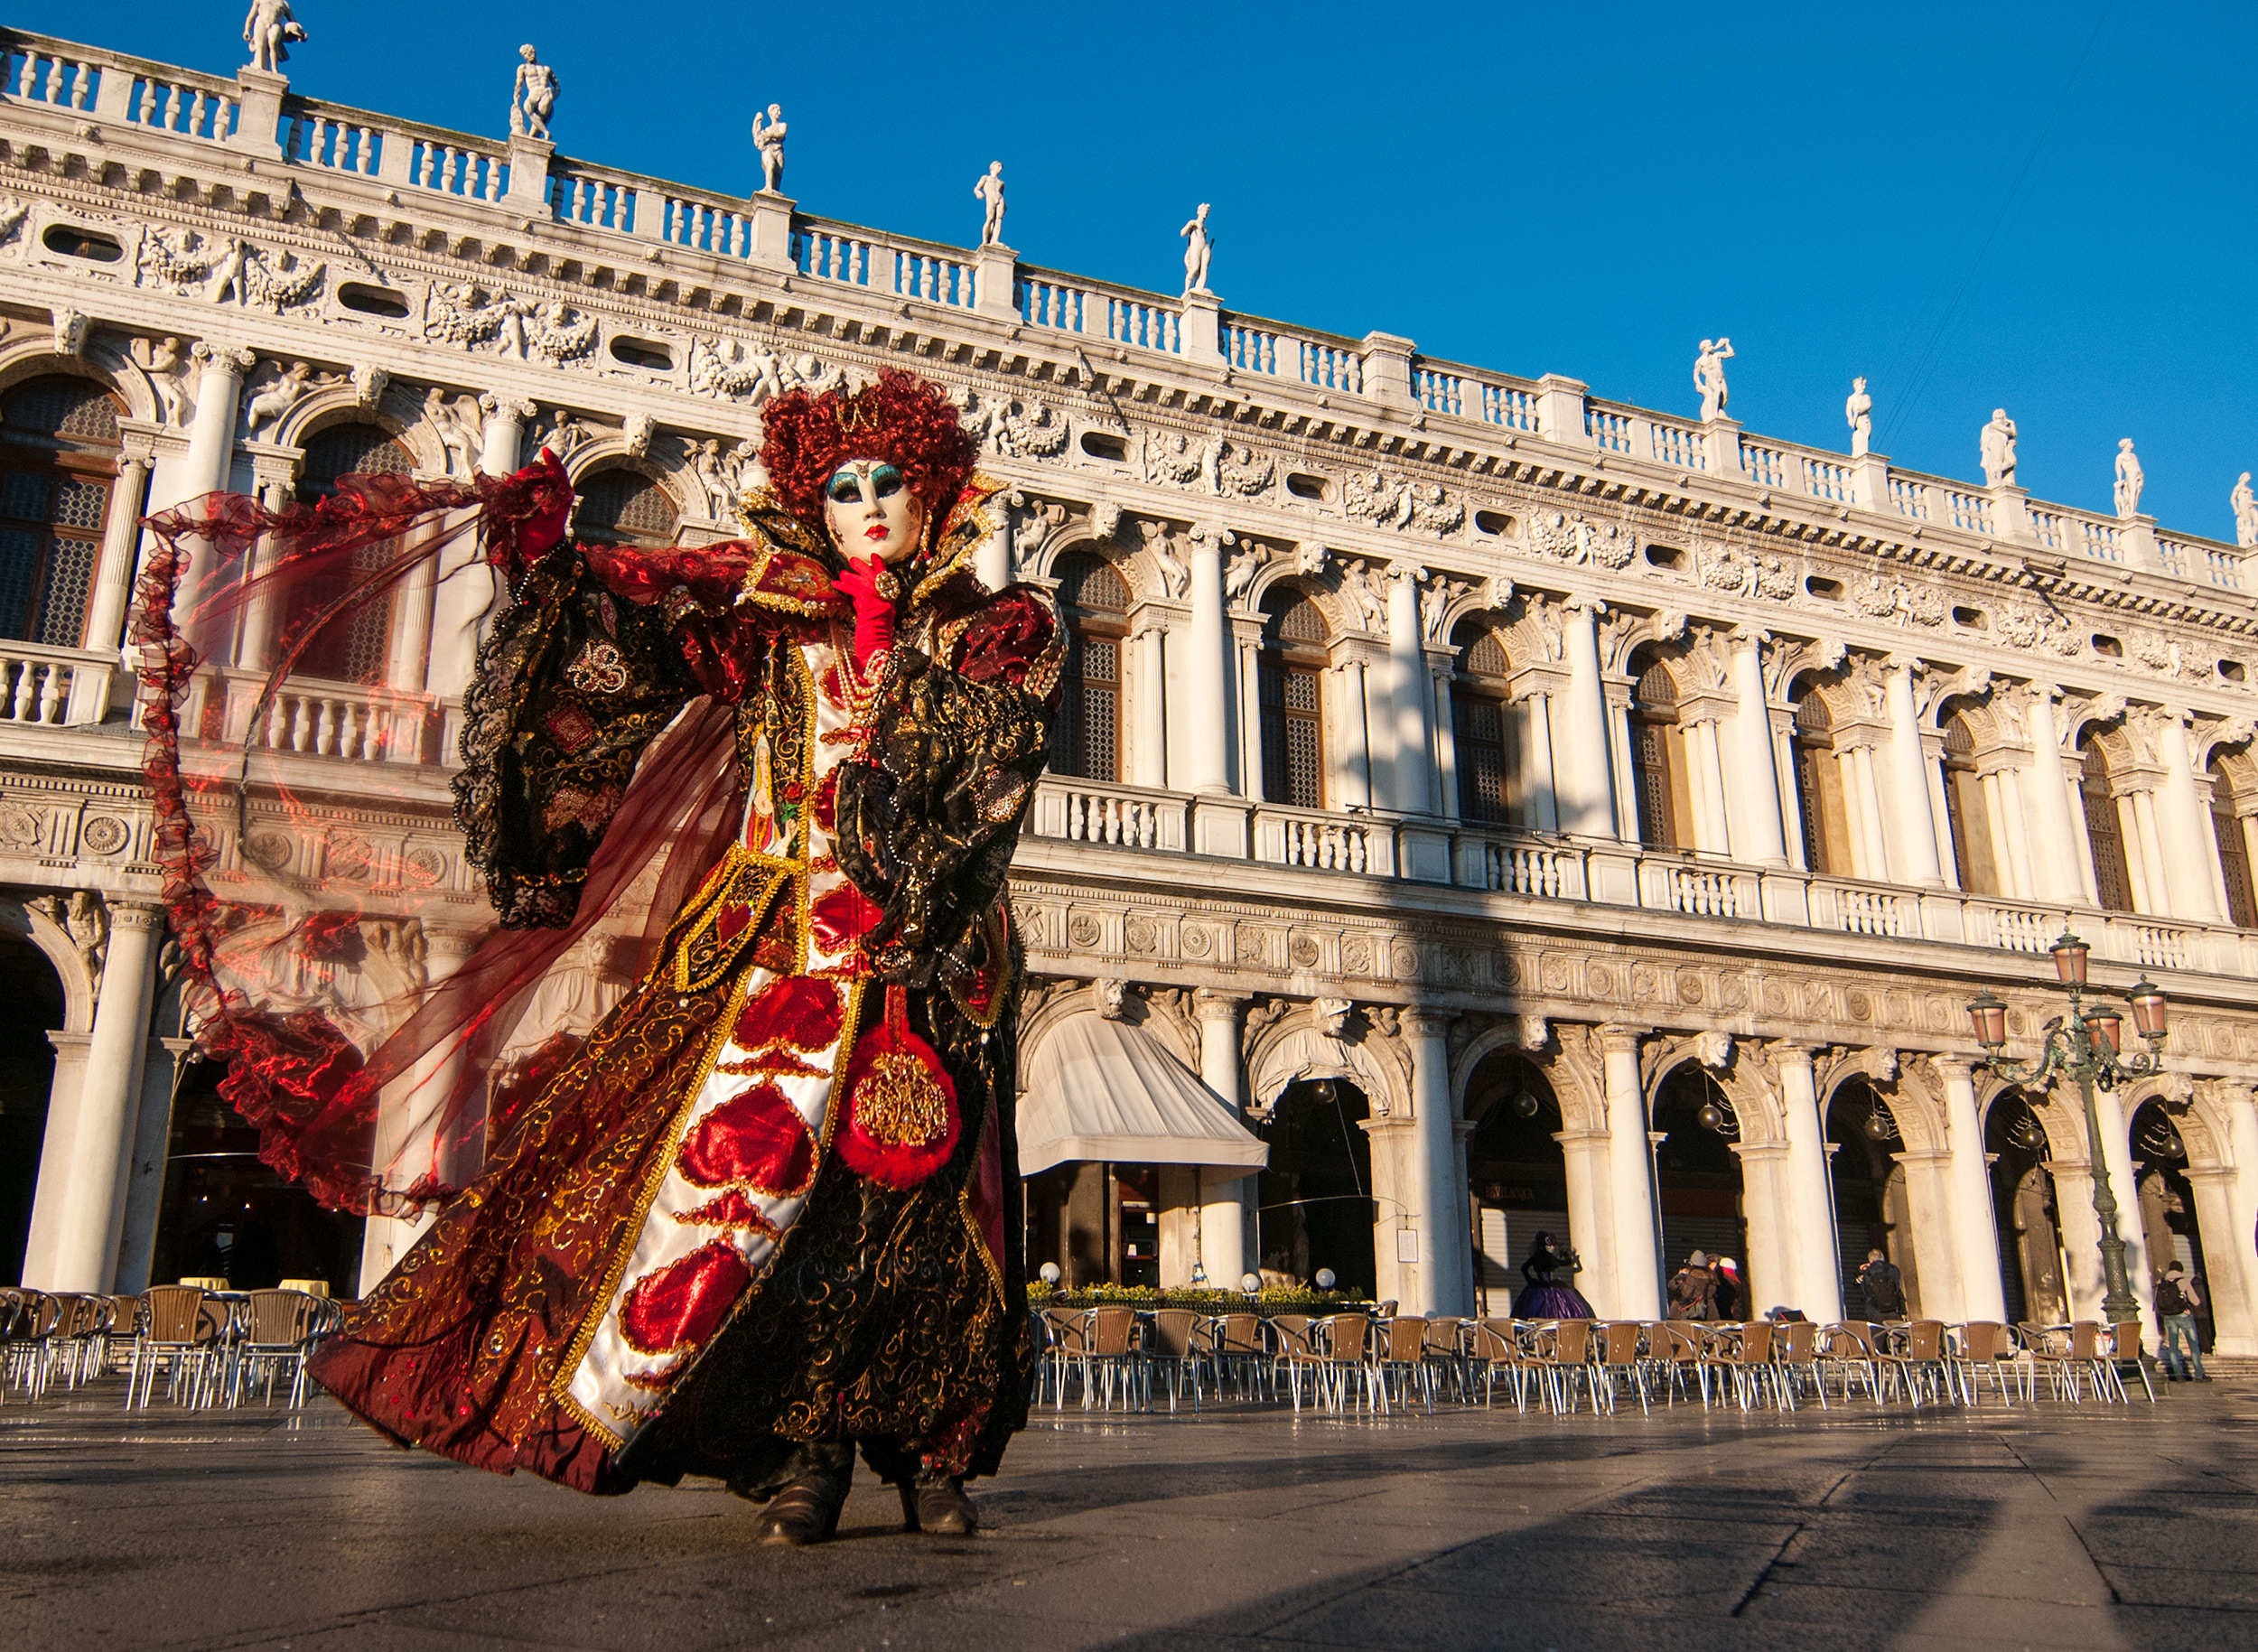 Karneval In Venedig Historische Tradition Moderne